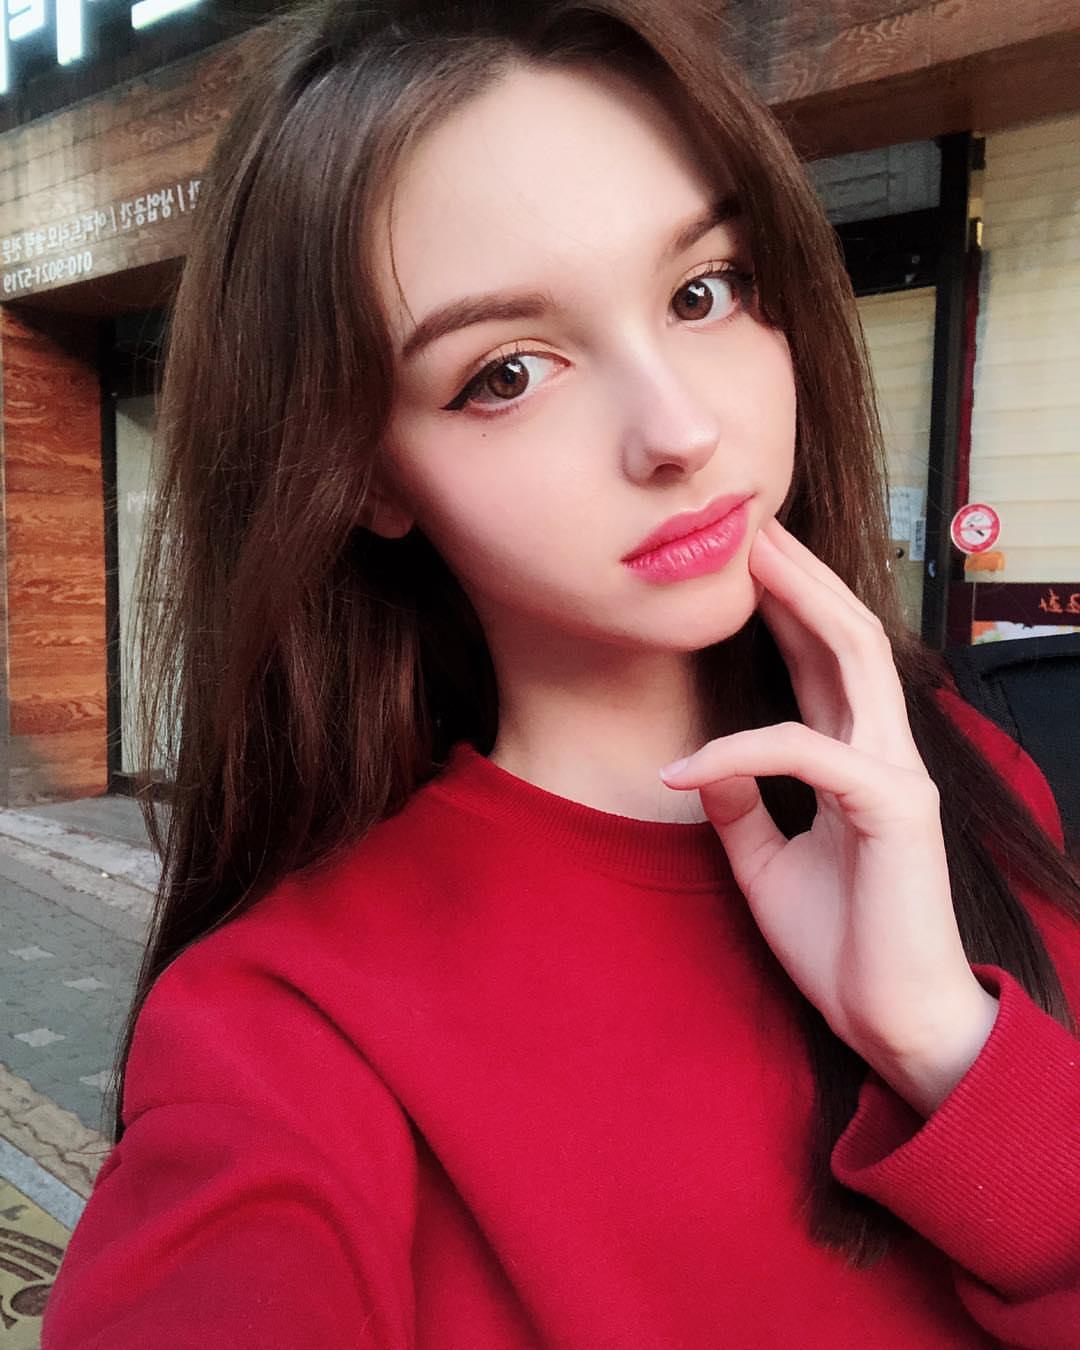 Hot Elina Love nude photos 2019